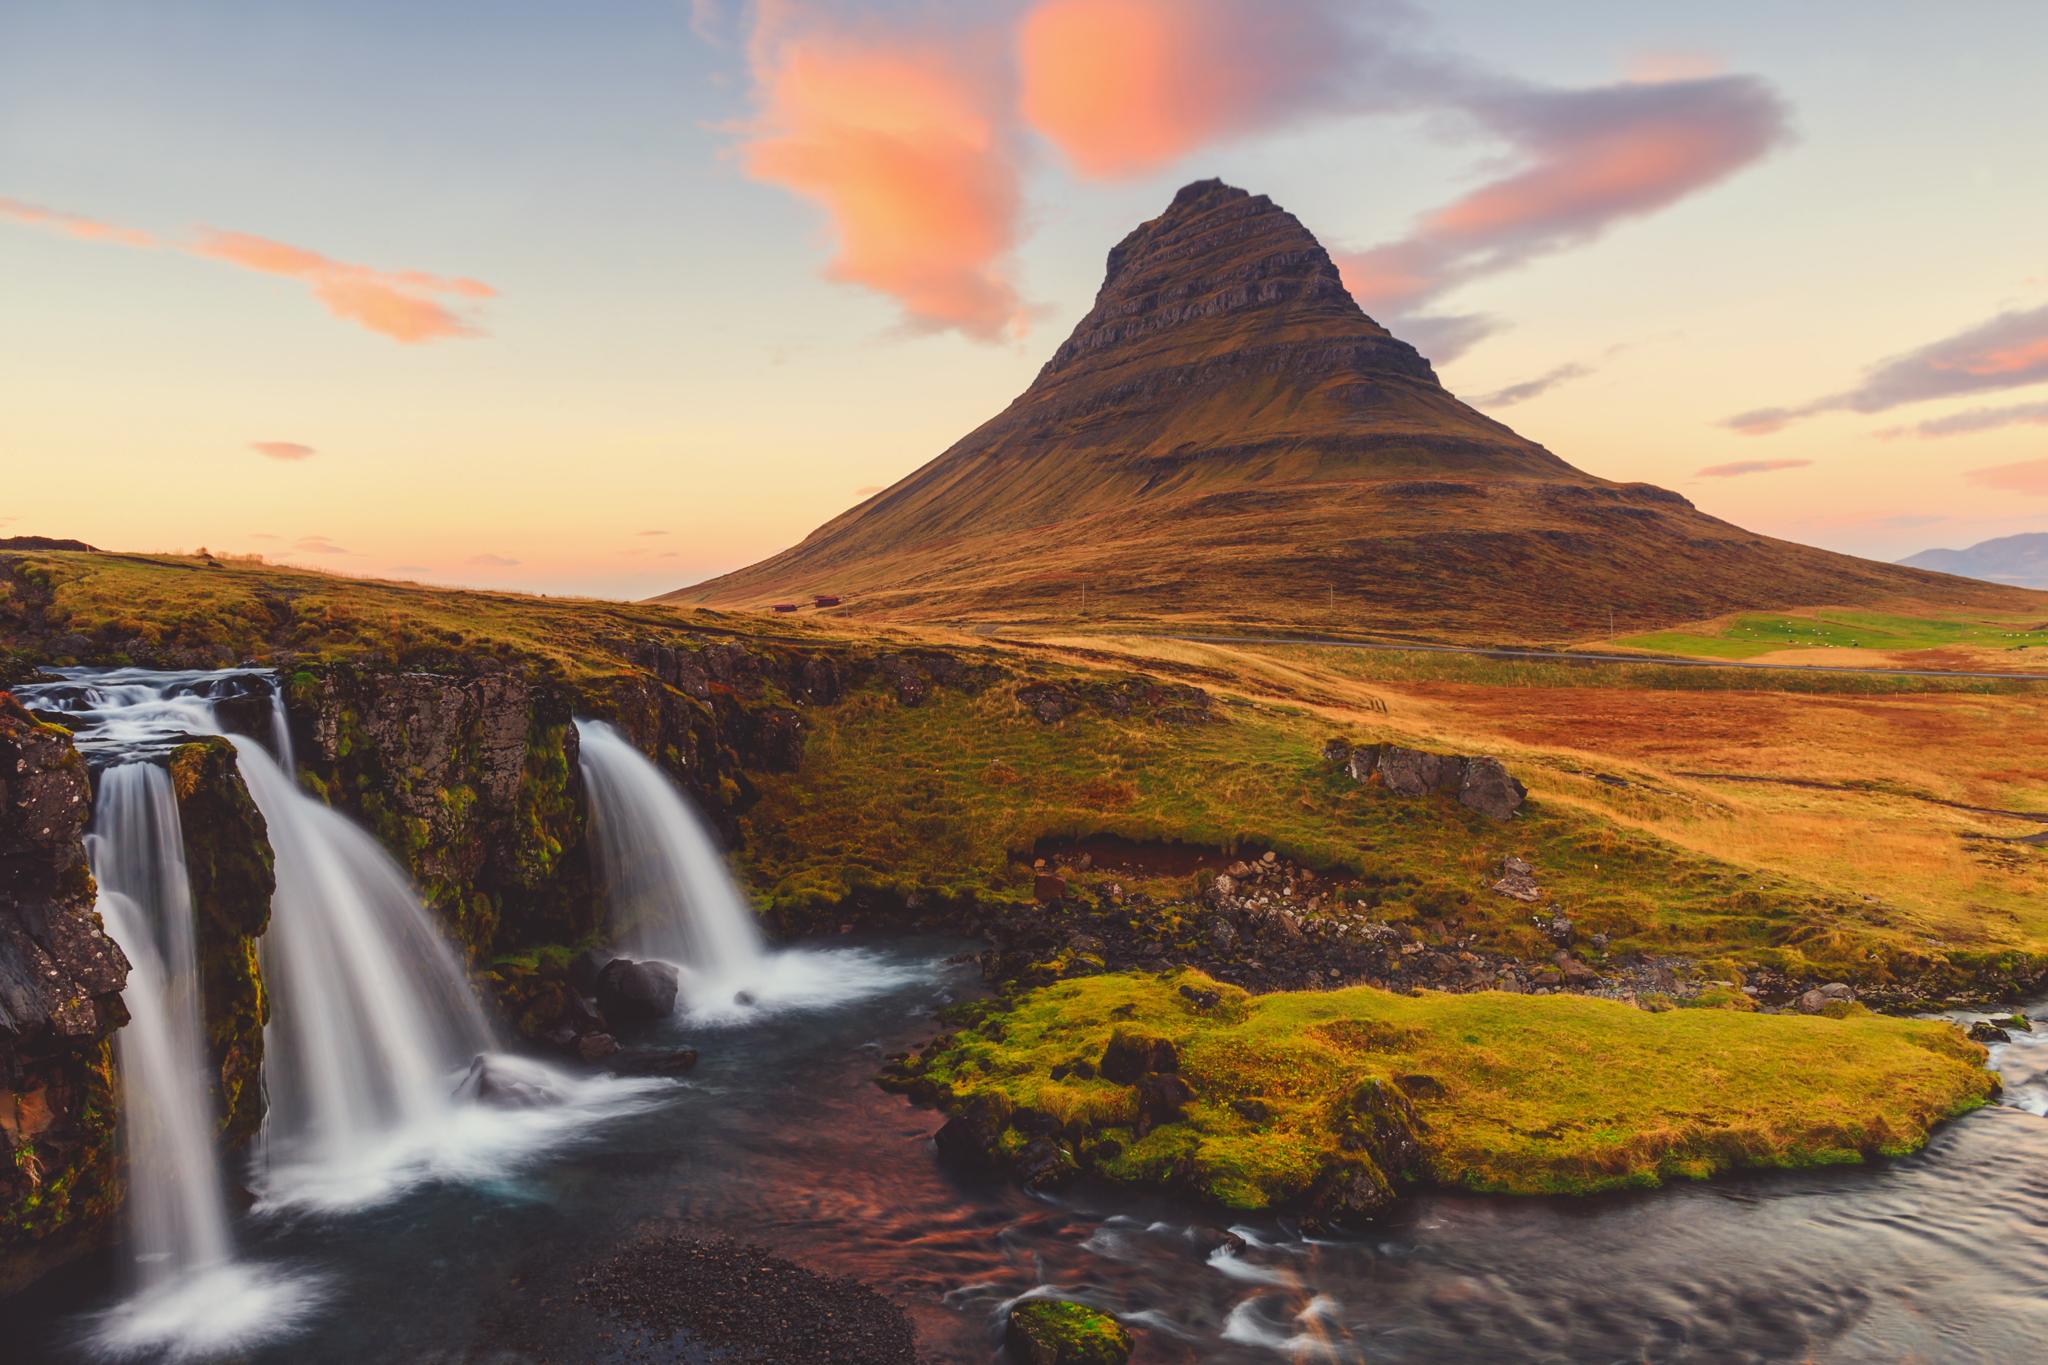 kirkjufell, iceland, jennifer picard photography, travel photographer